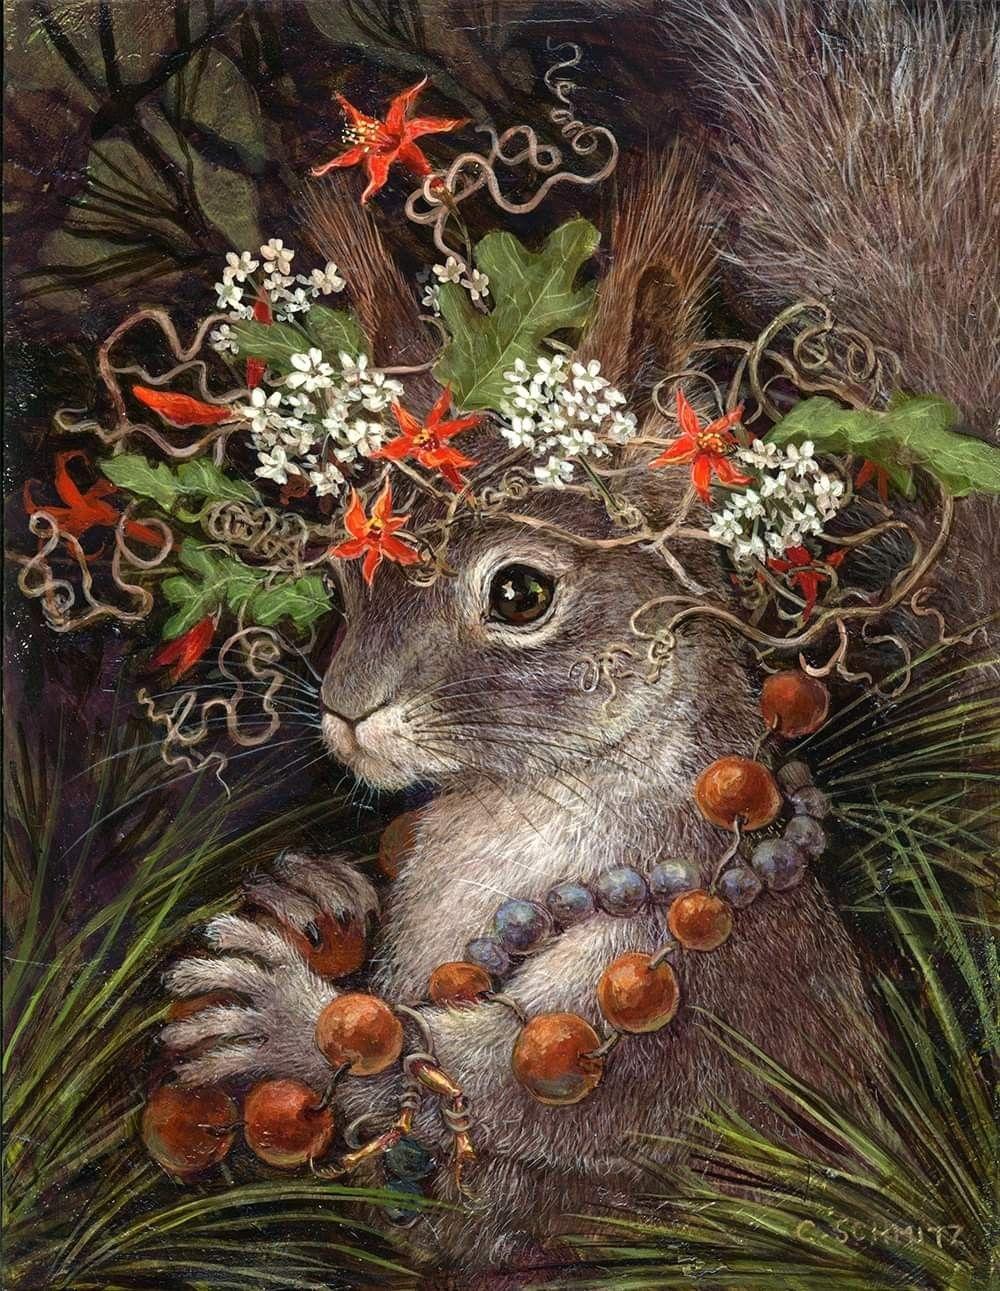 Animal art image by Anita Burnevik Ruic on FANTISY ART